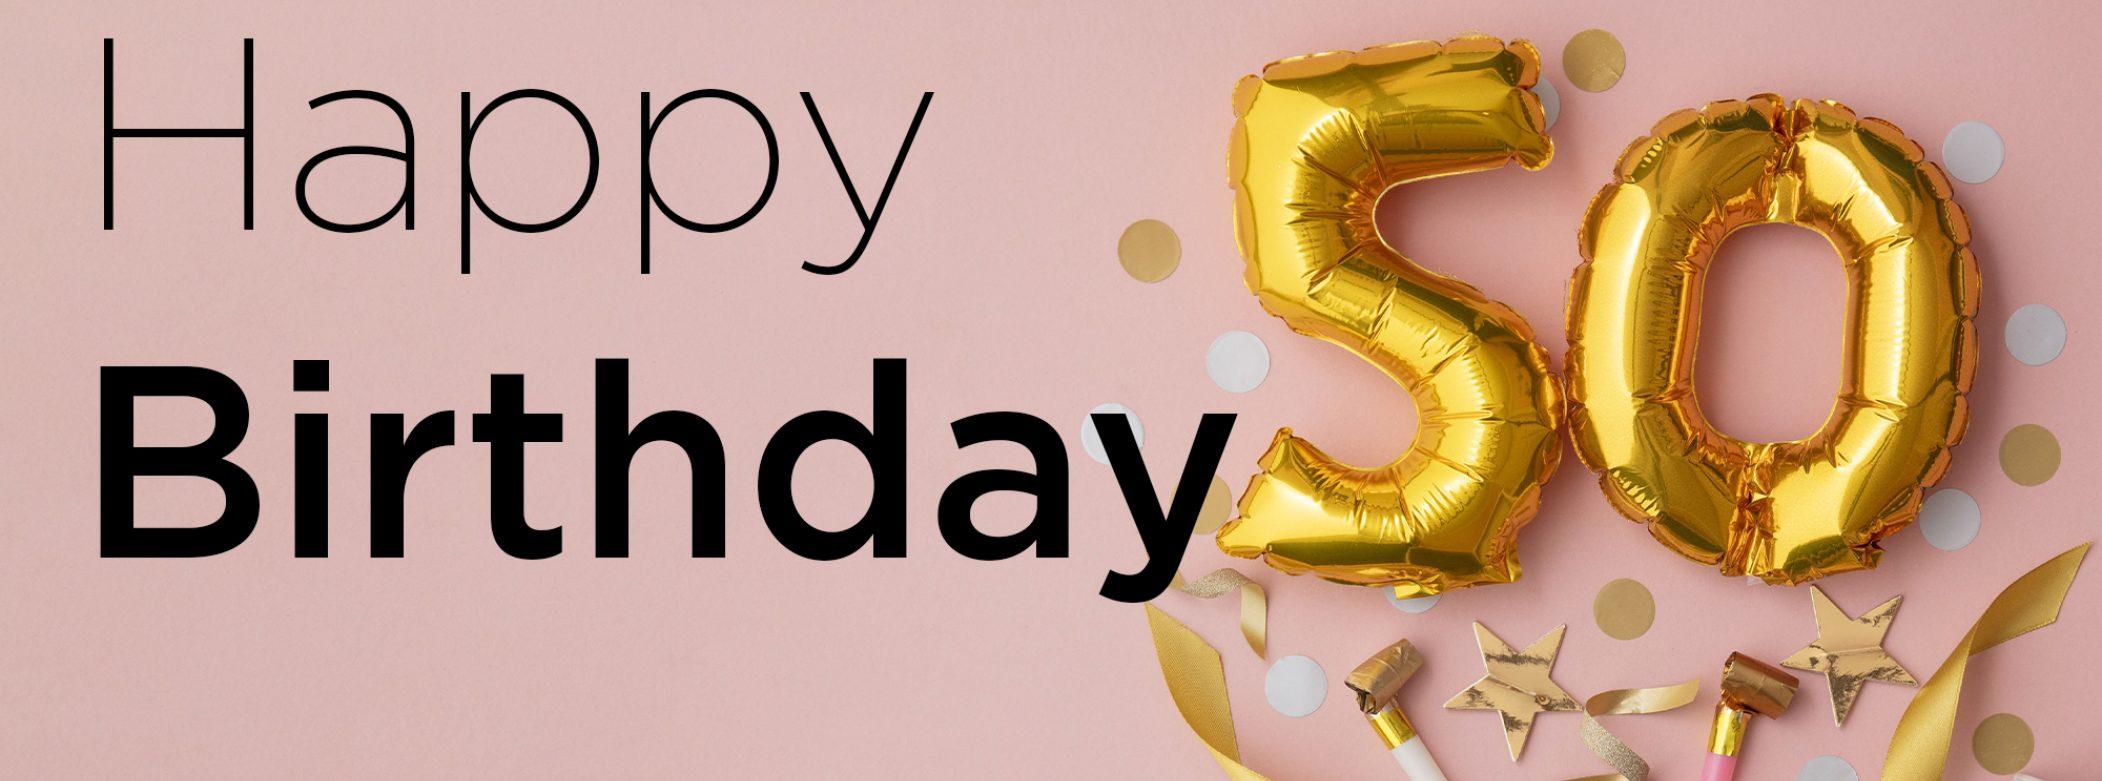 Happay Birthday Homepage